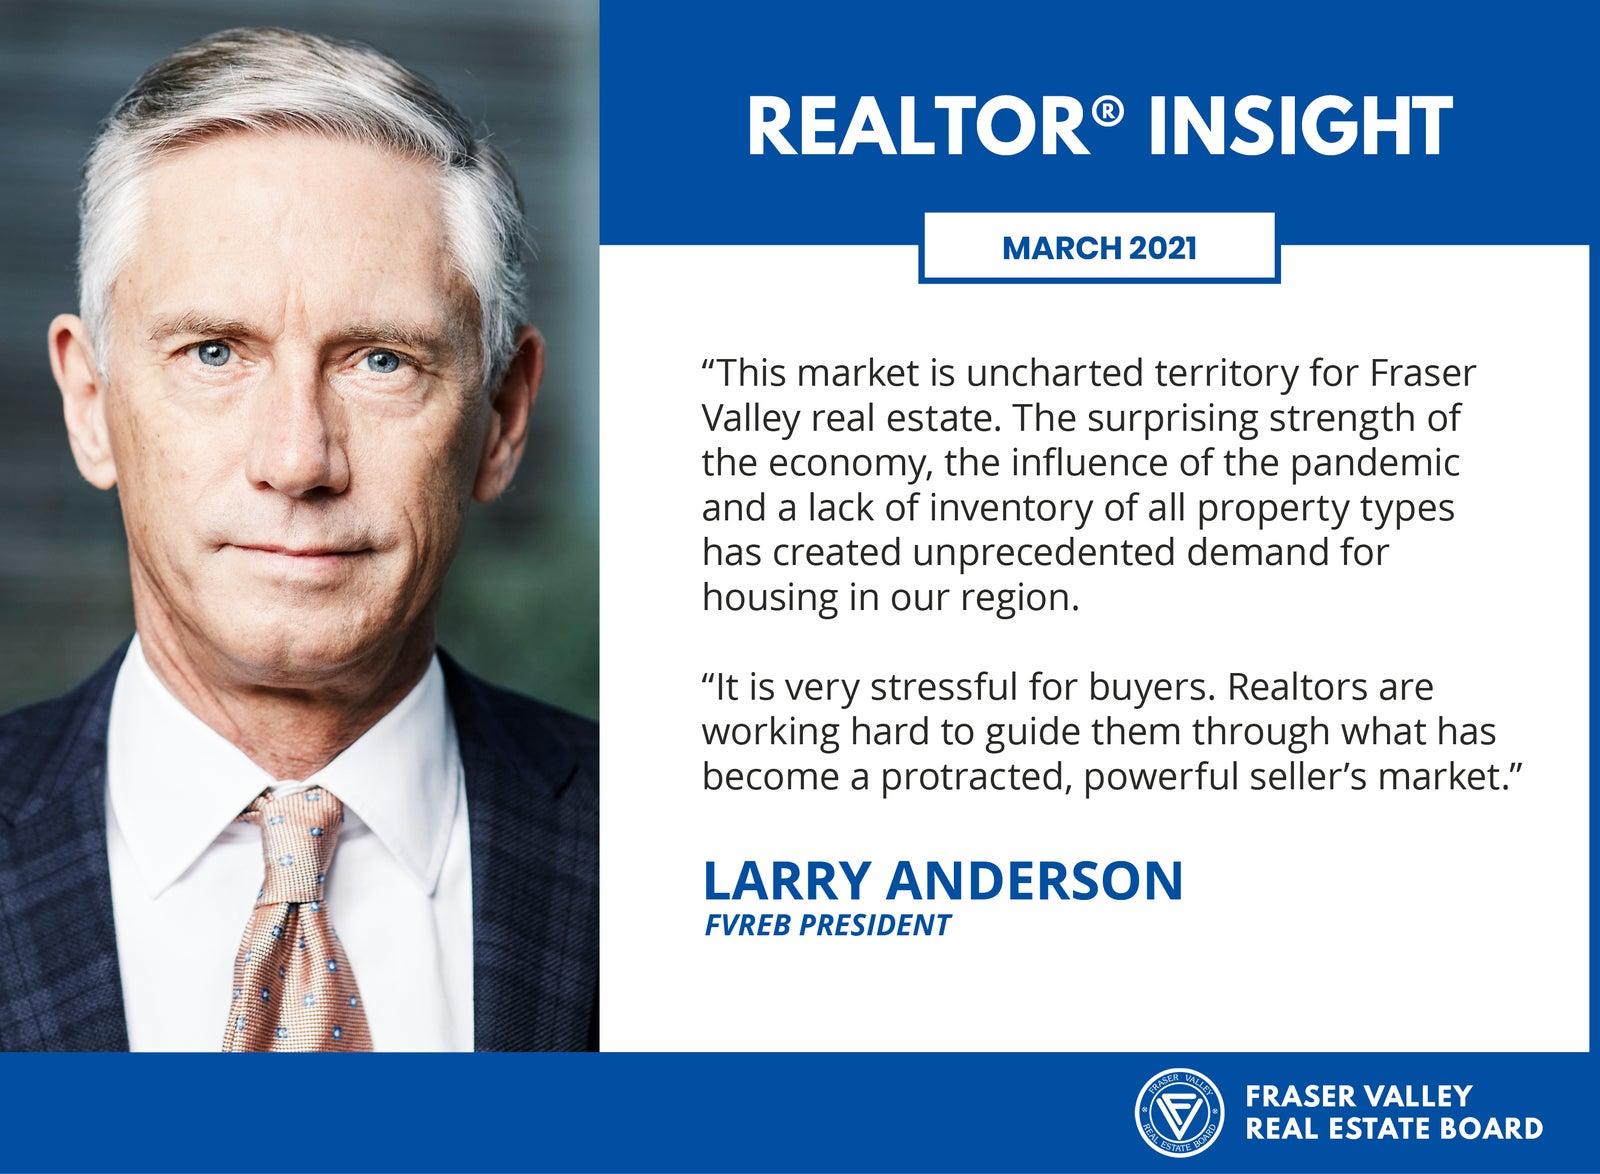 Realtor® Insight March 2021 - FVREB